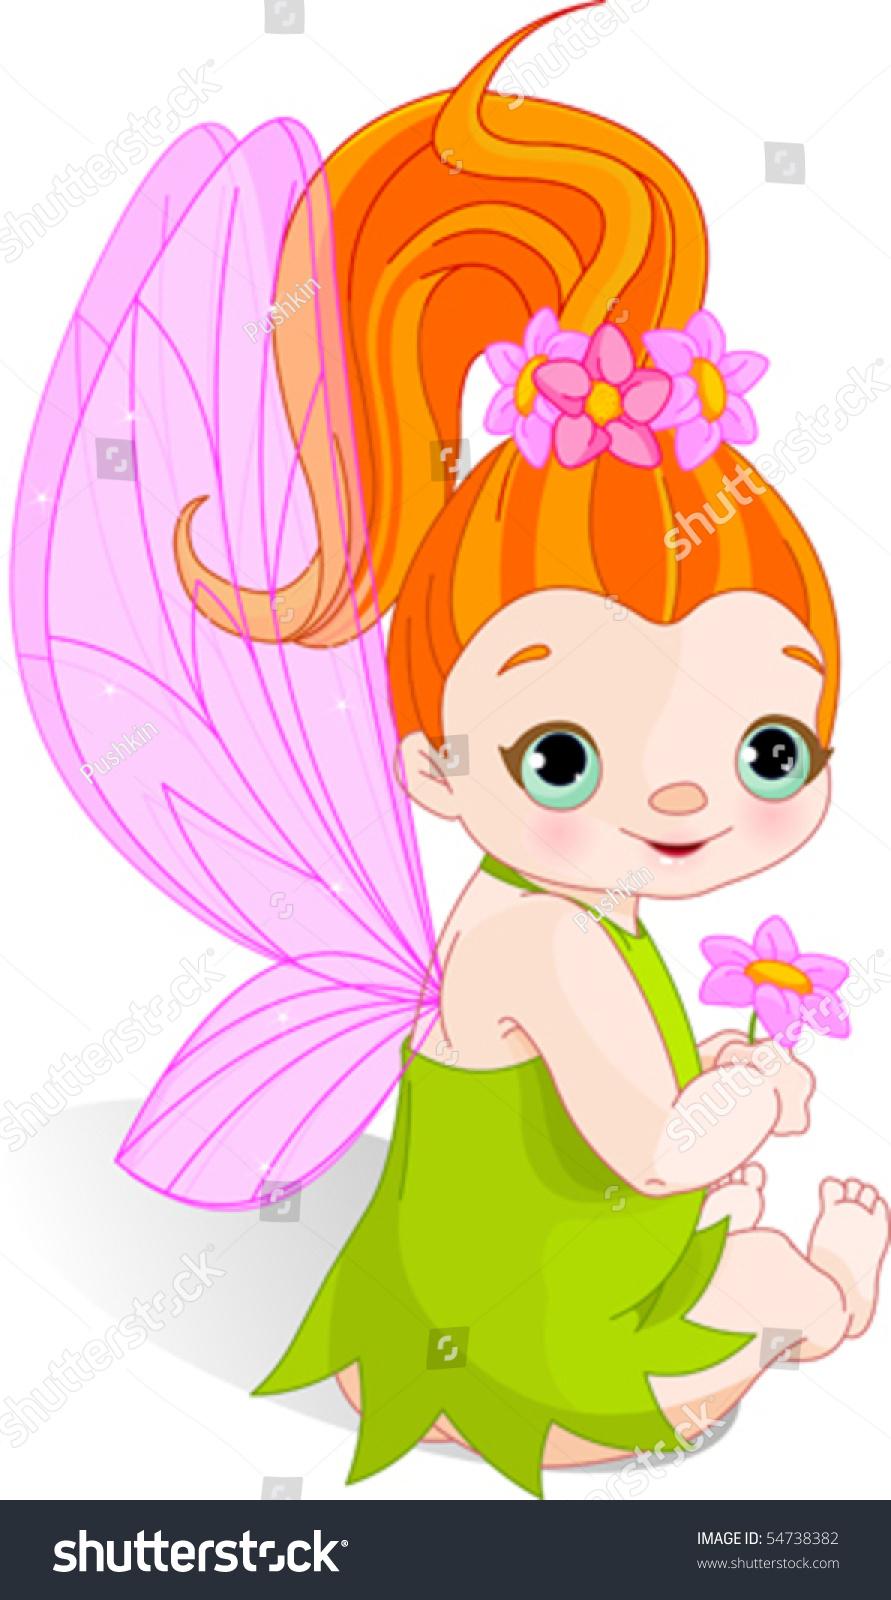 Cute Baby Fairies: Sitting Cute Baby Fairy With Flower Stock Vector